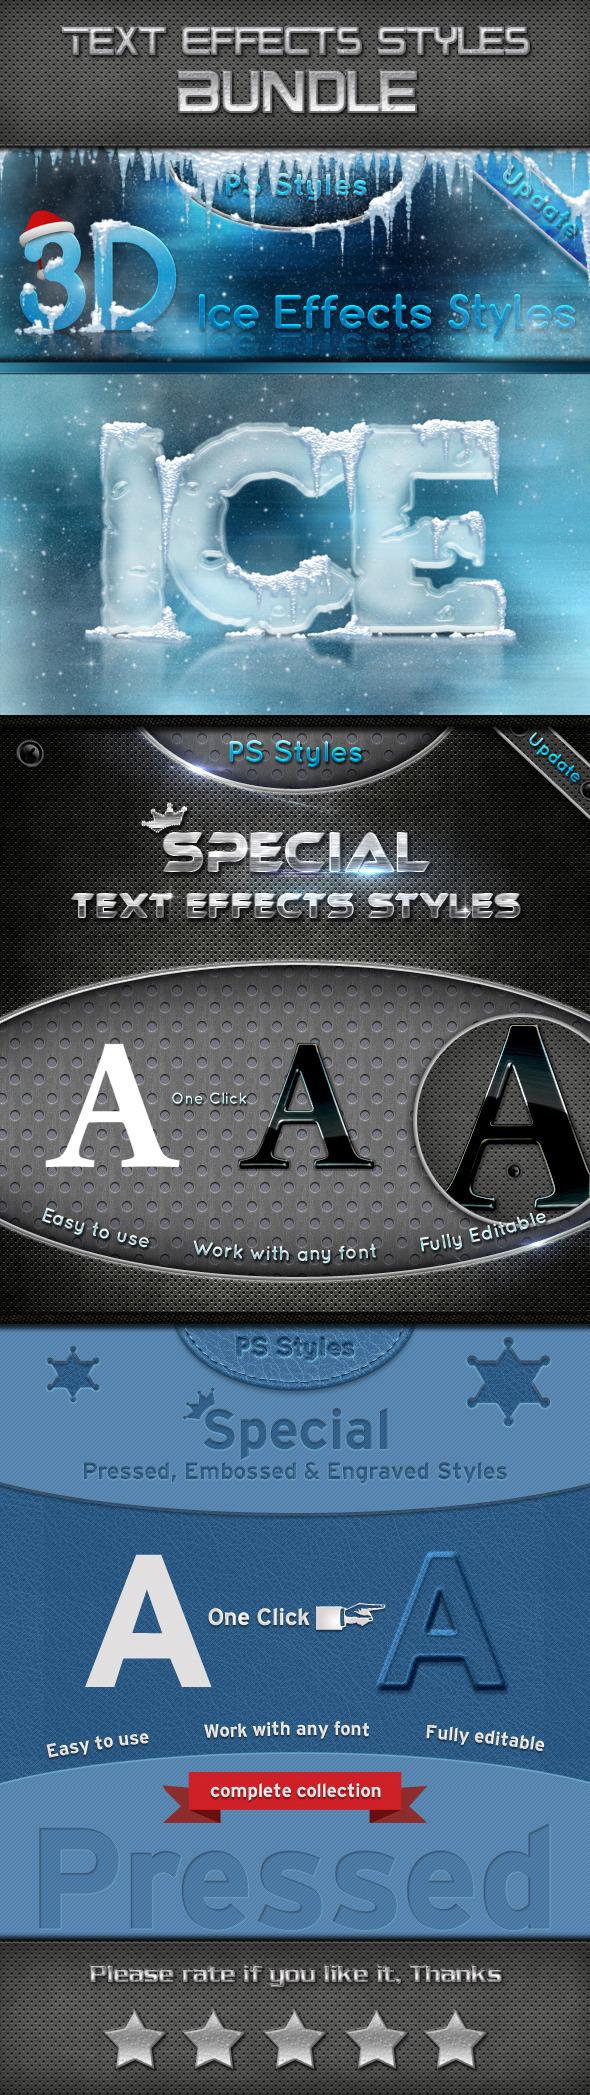 Text Effects Styles Bundle - Styles Photoshop